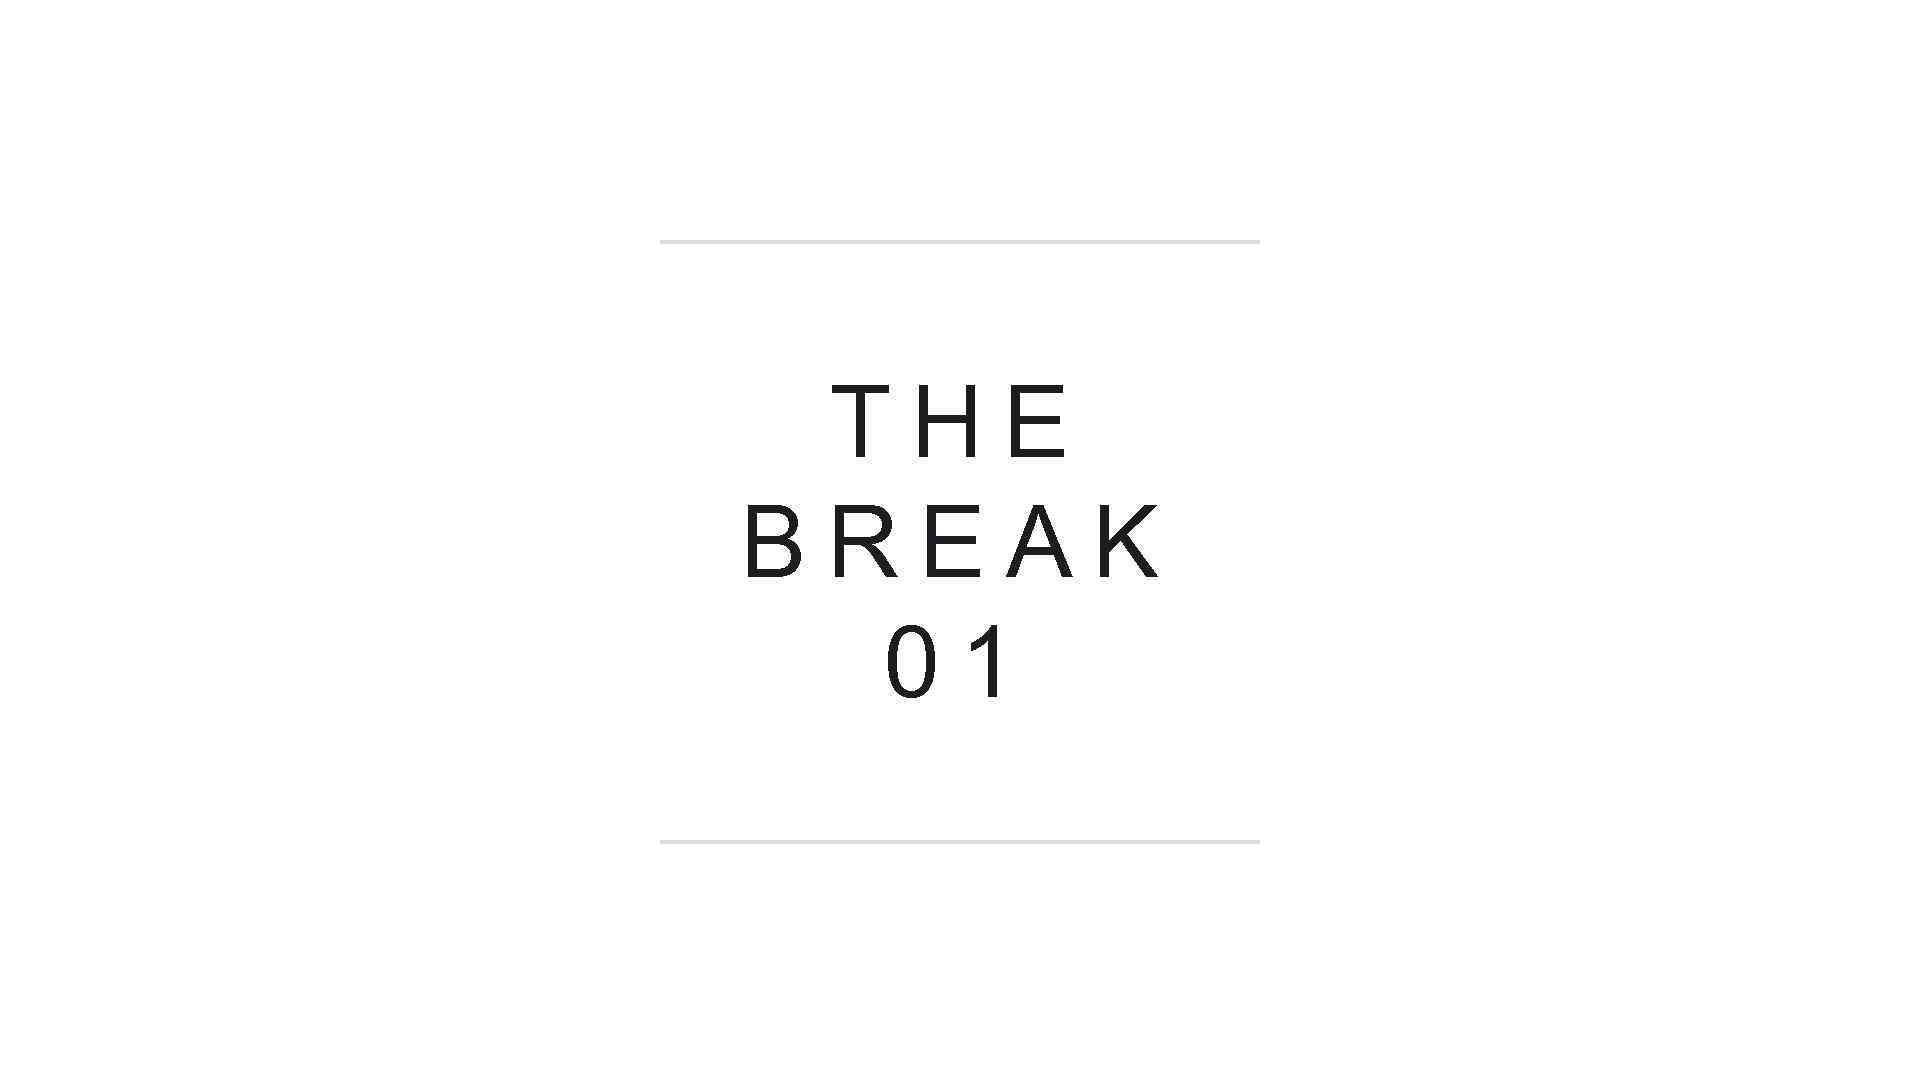 THE BREAK 01